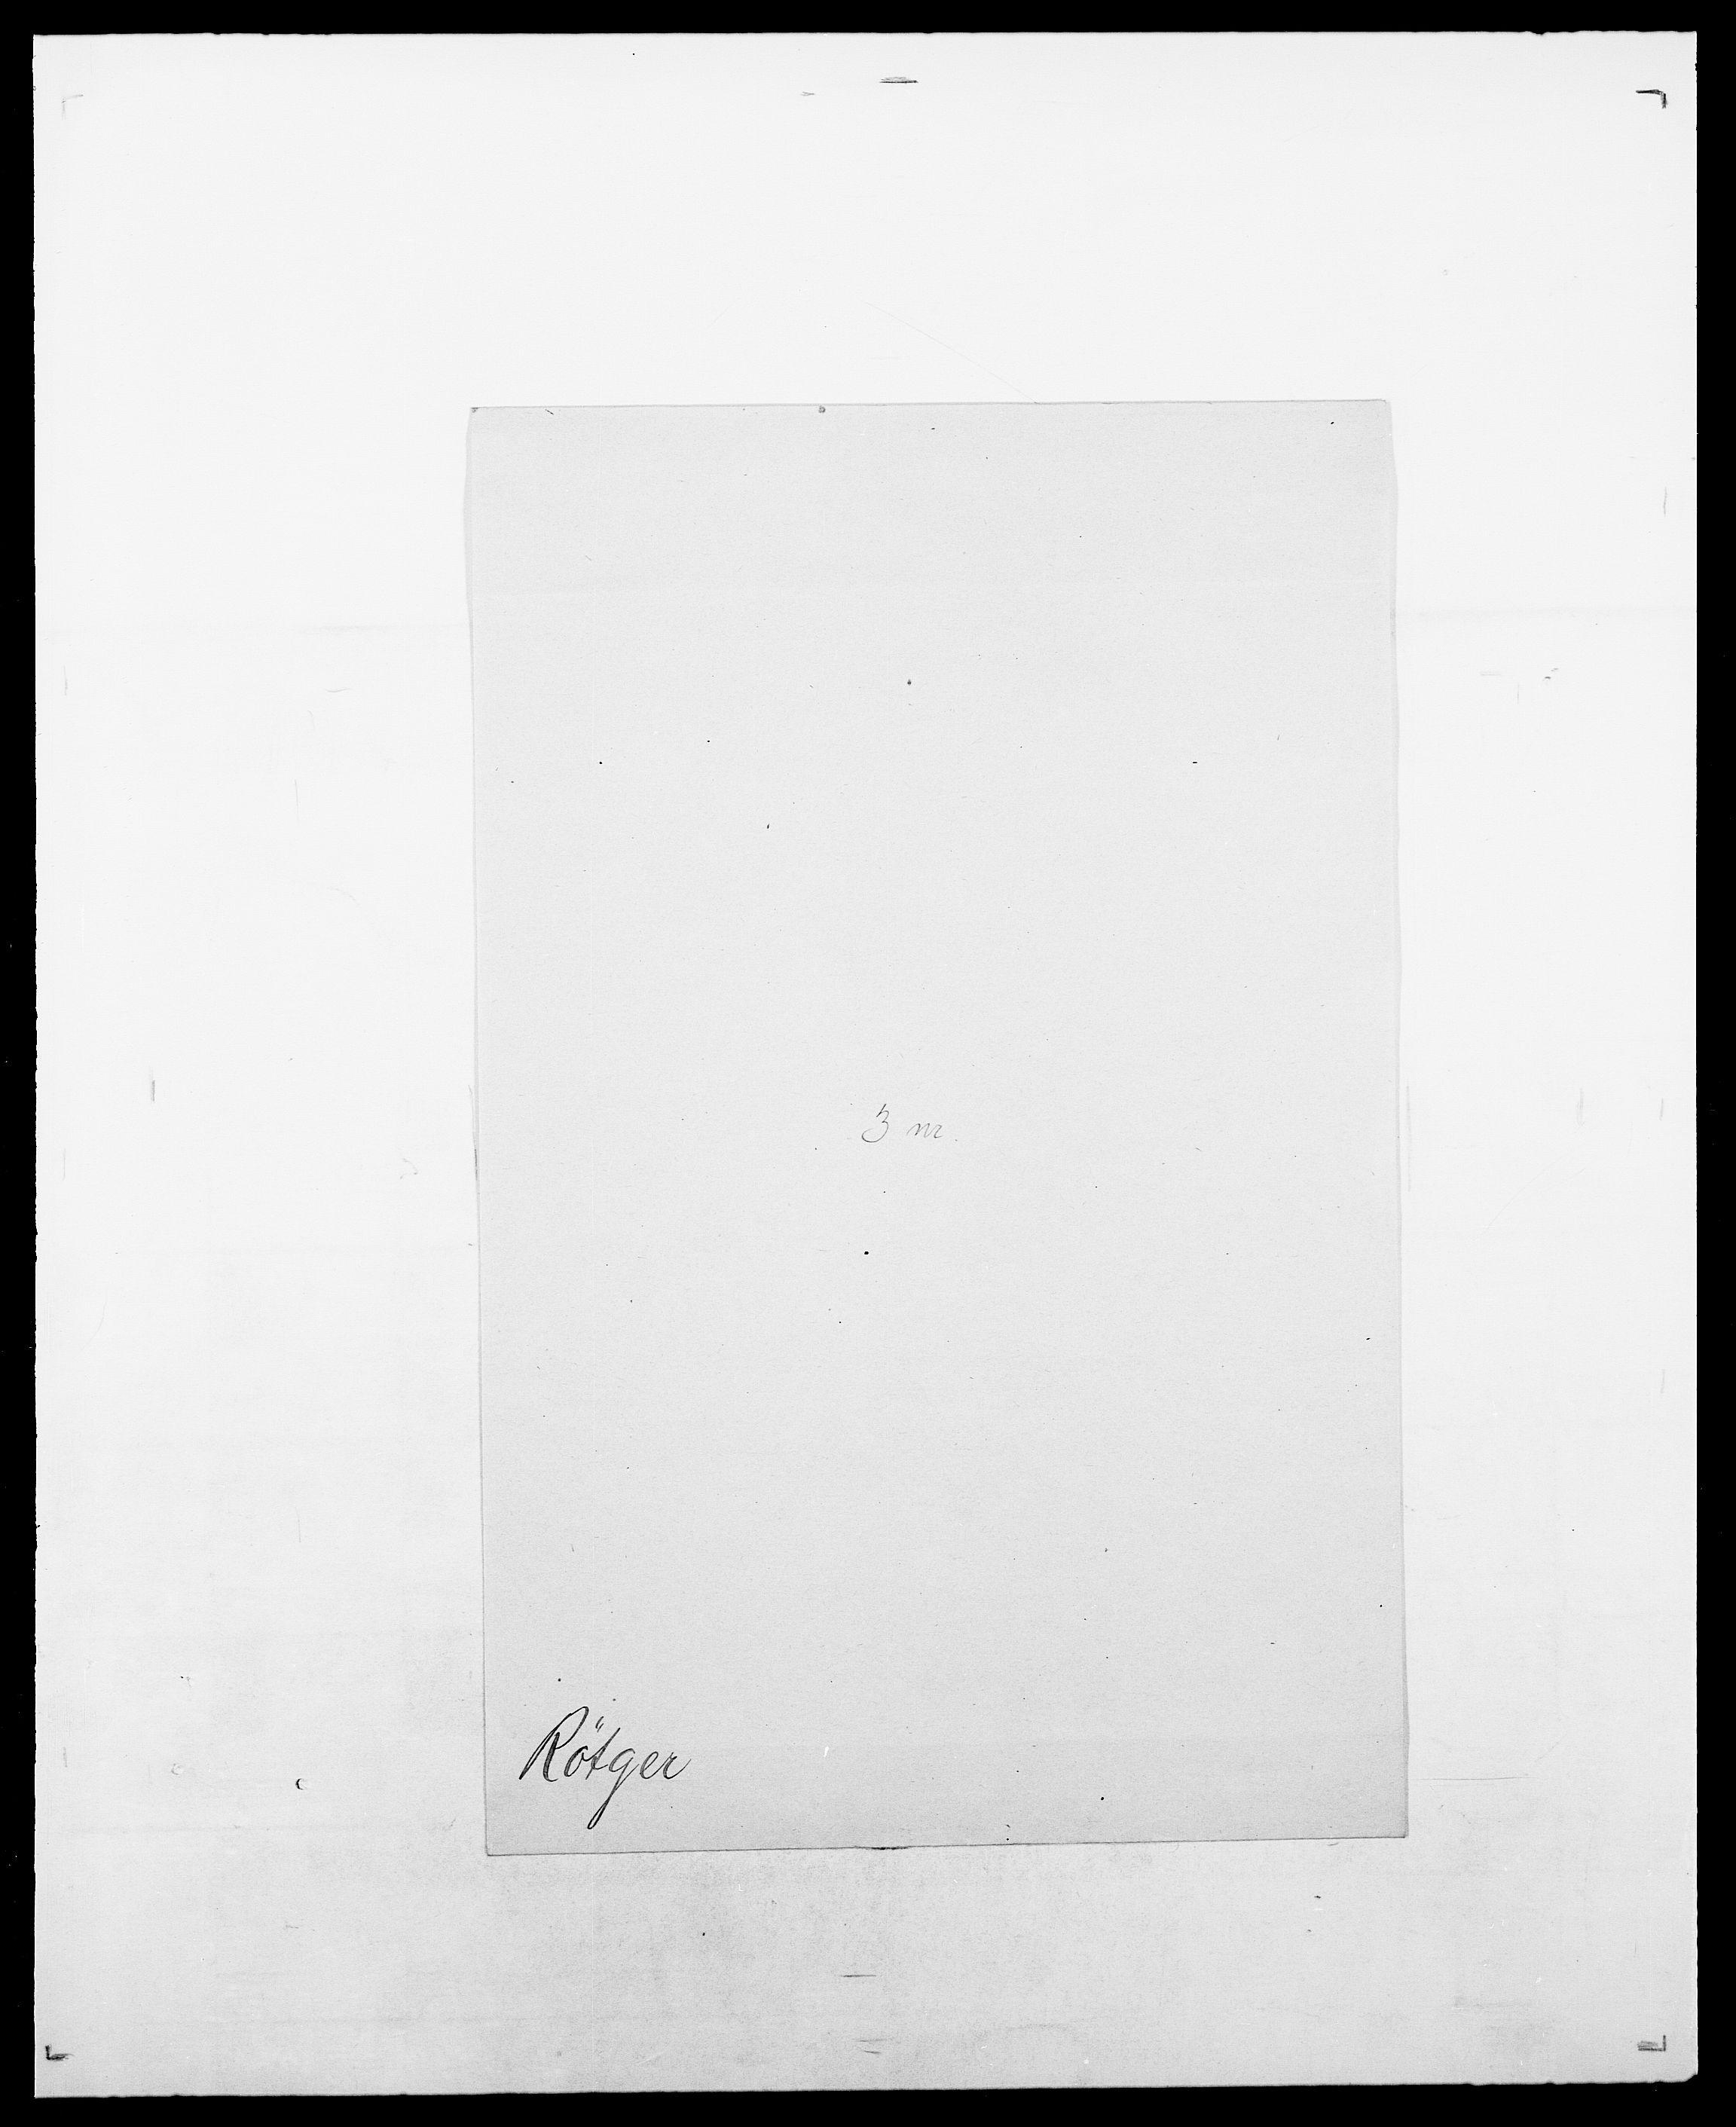 SAO, Delgobe, Charles Antoine - samling, D/Da/L0033: Roald - Røyem, s. 818